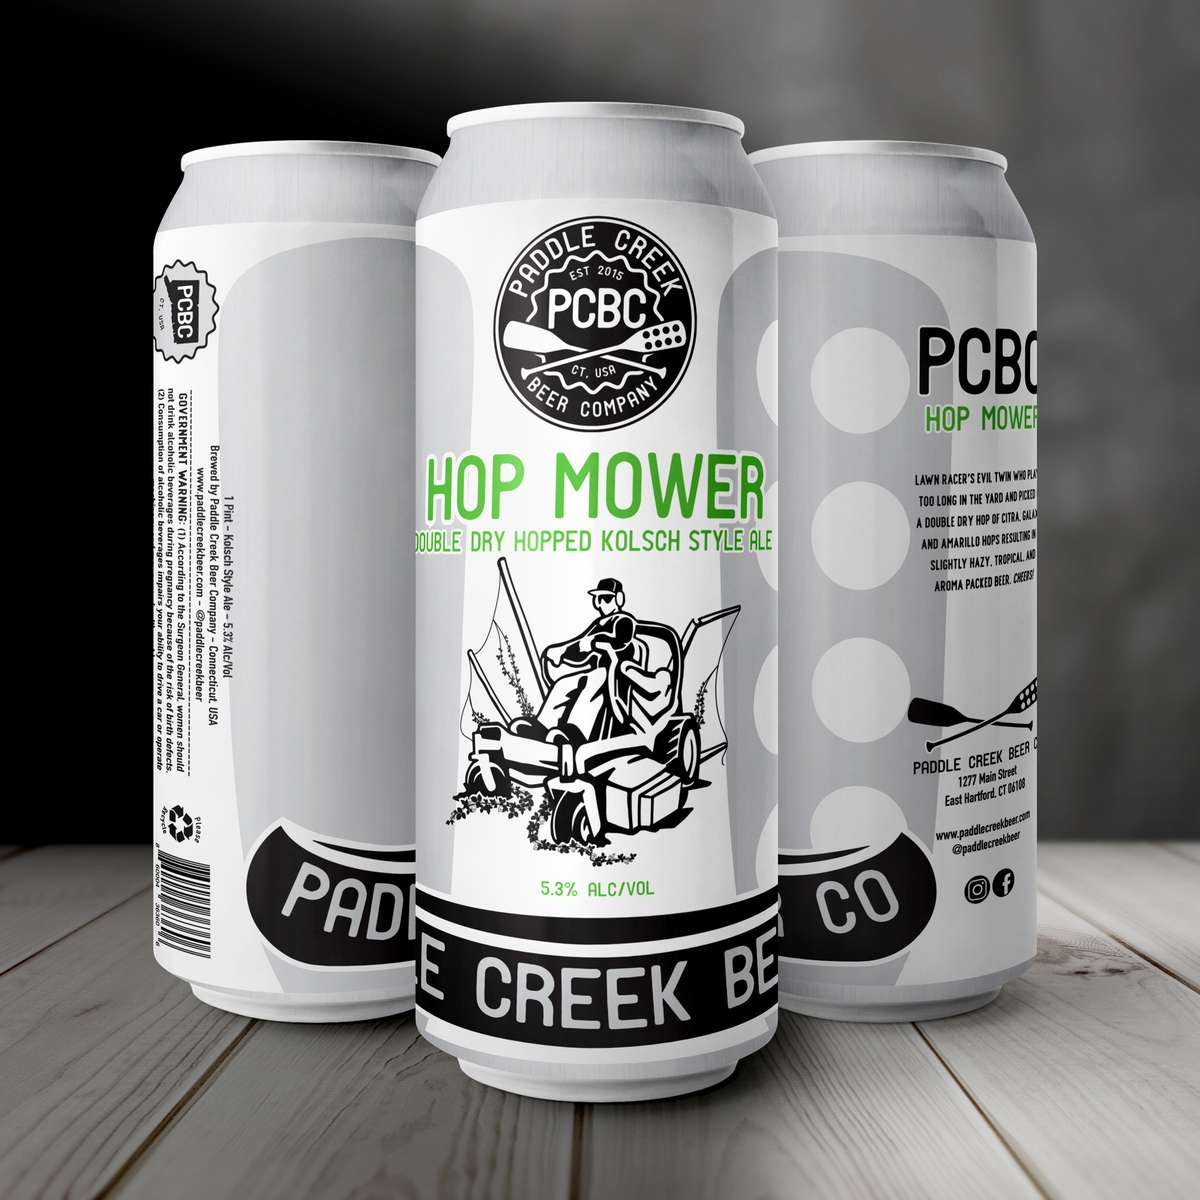 Hop Mower